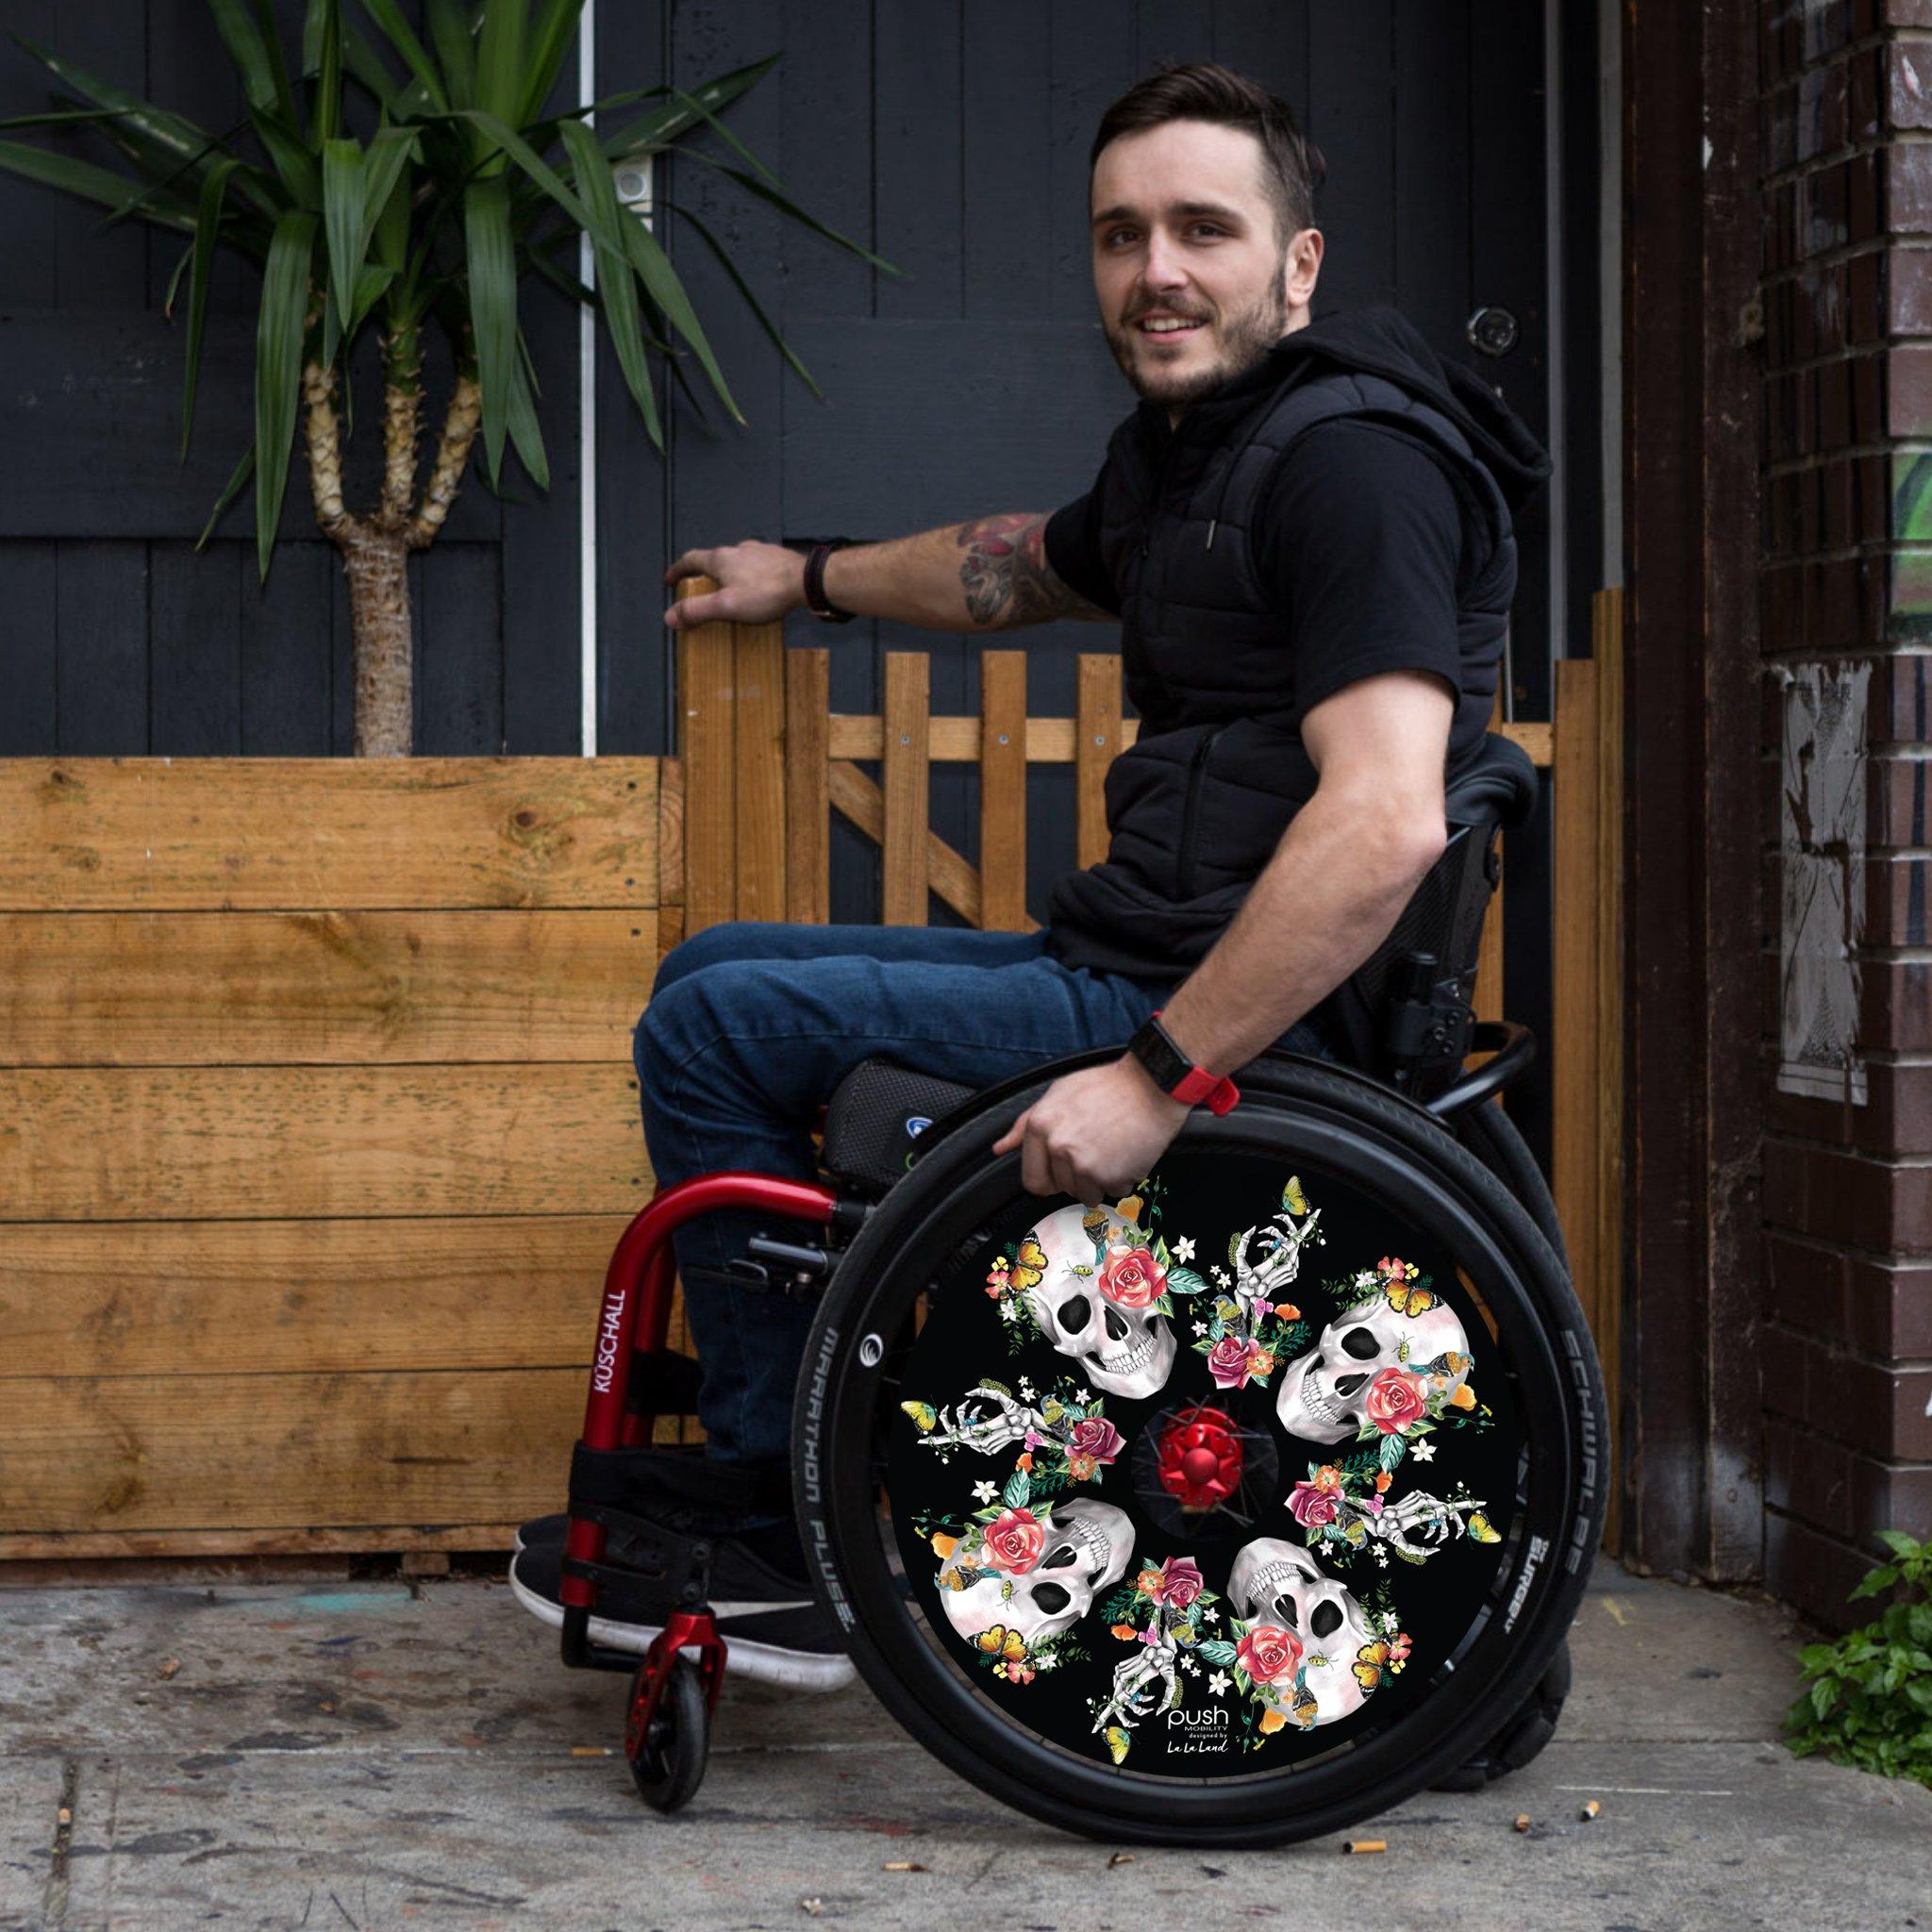 Beautiful Bones Push Hub black wheel cover on wheelchair with man with tatoos